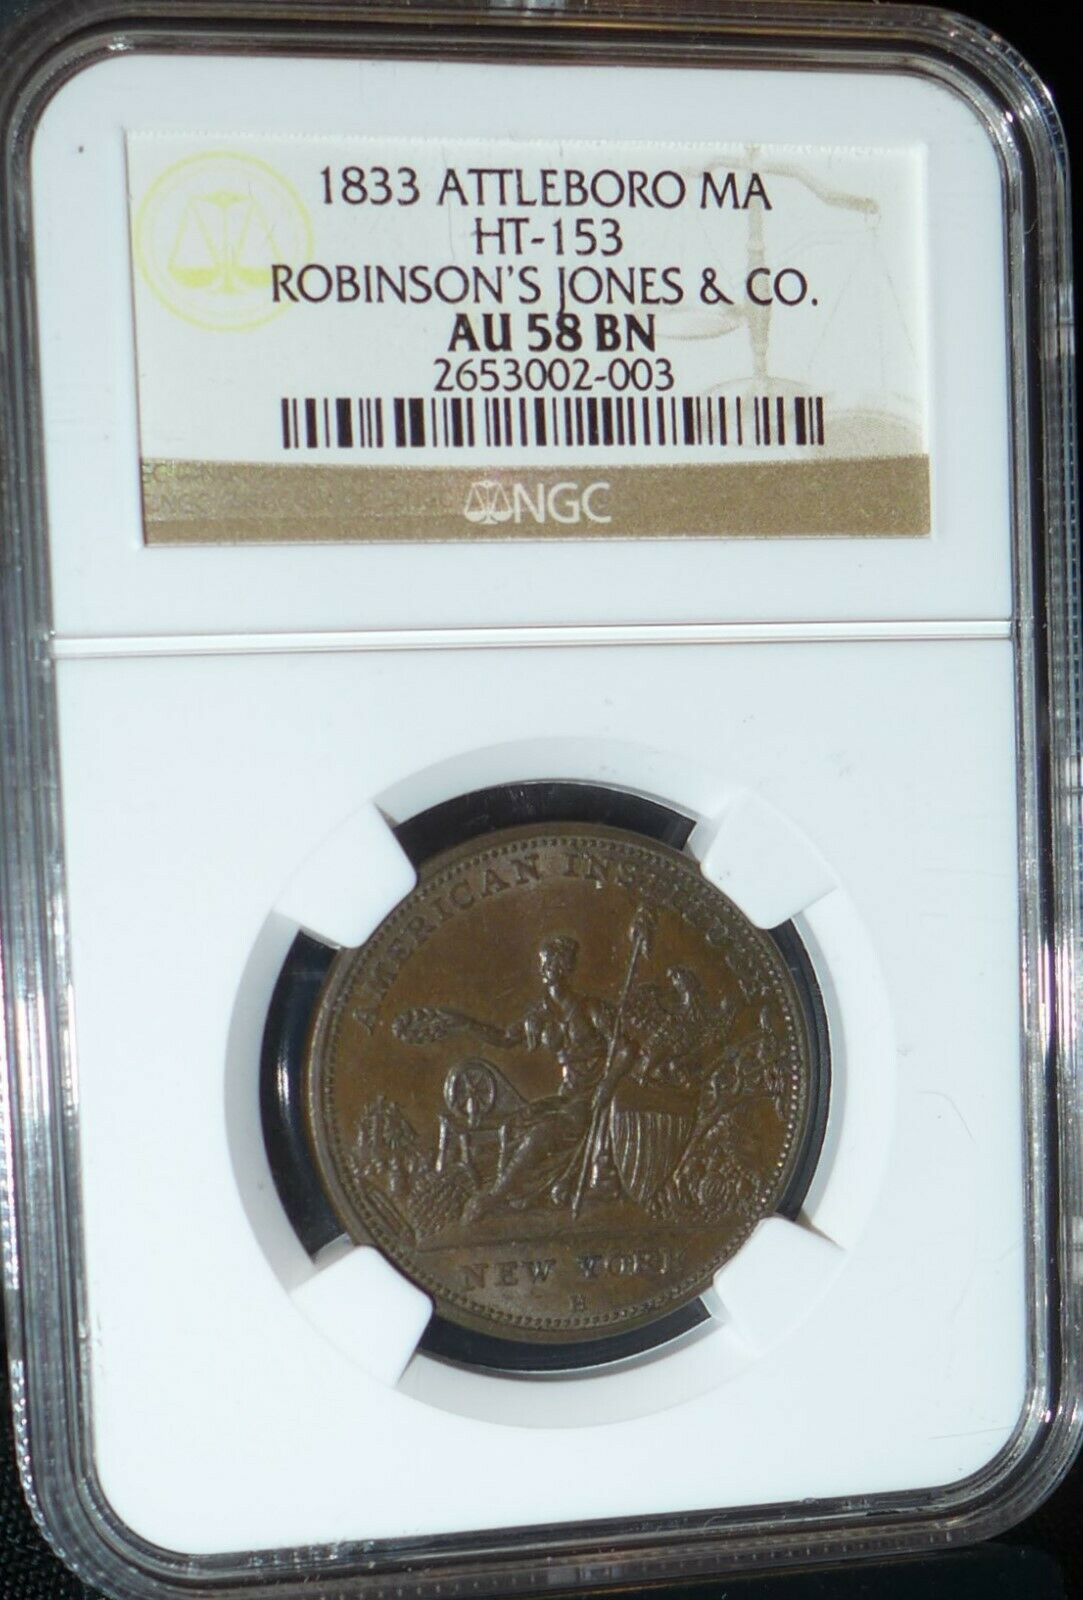 1833 Hard Times Token, Robinson s Jones Co., HT-153, Attleboro MA, AU58 BN NGC - $95.00